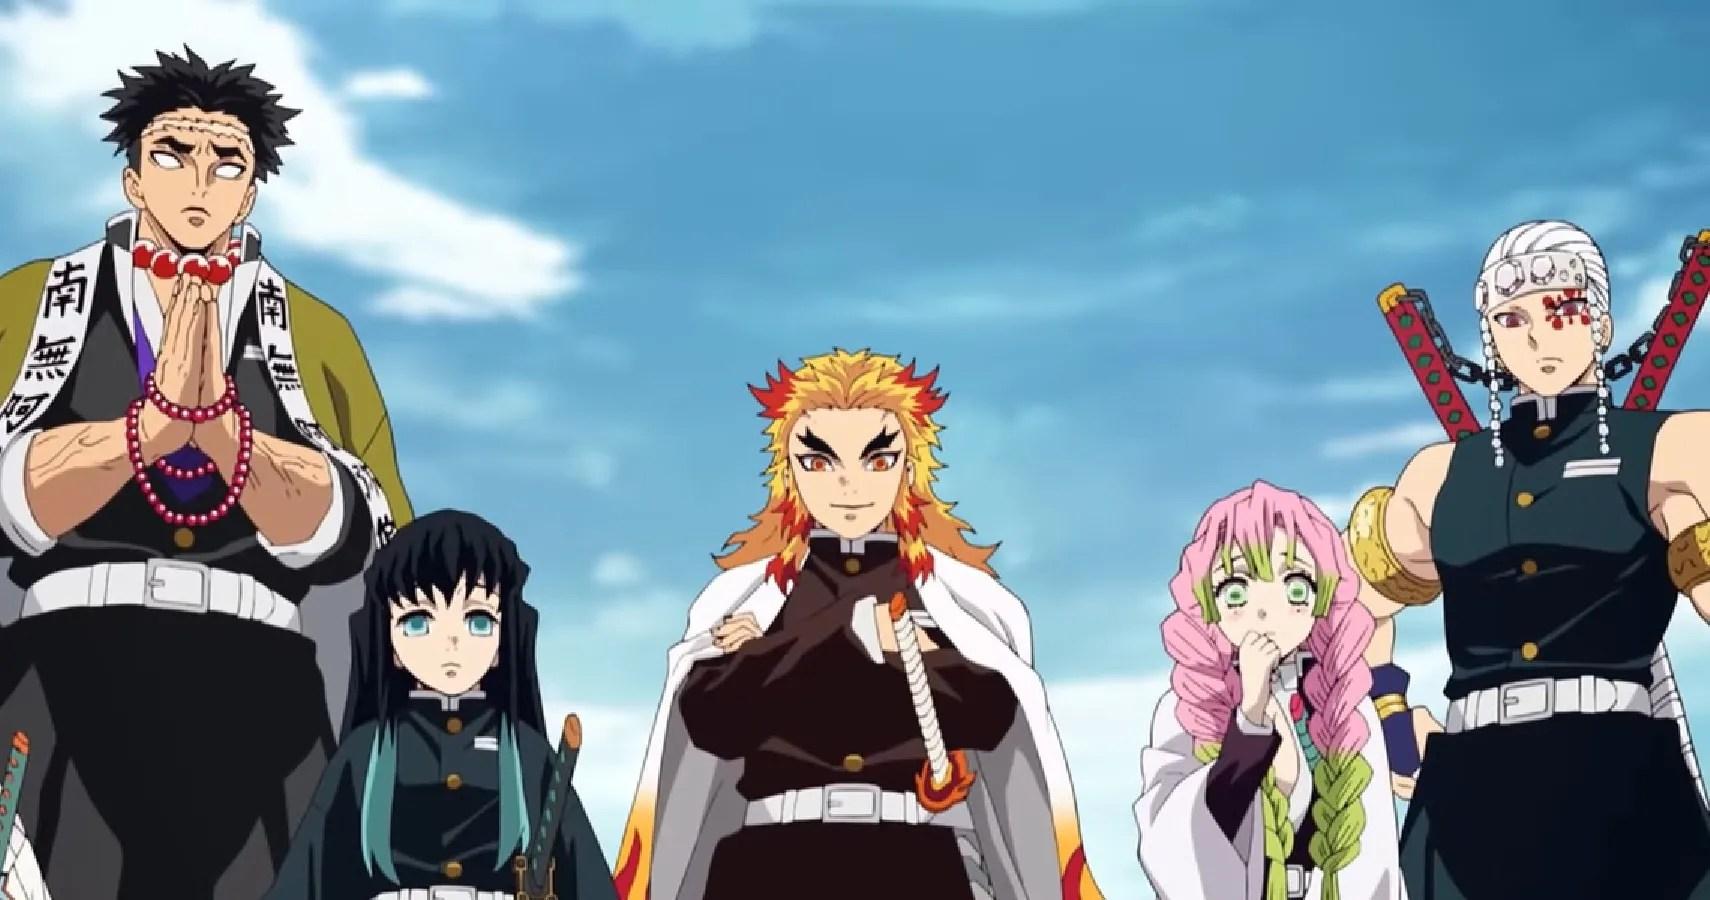 Ubuyashiki, the leader of the. Demon Slayer: Every Hashira, Ranked According to Strength ...